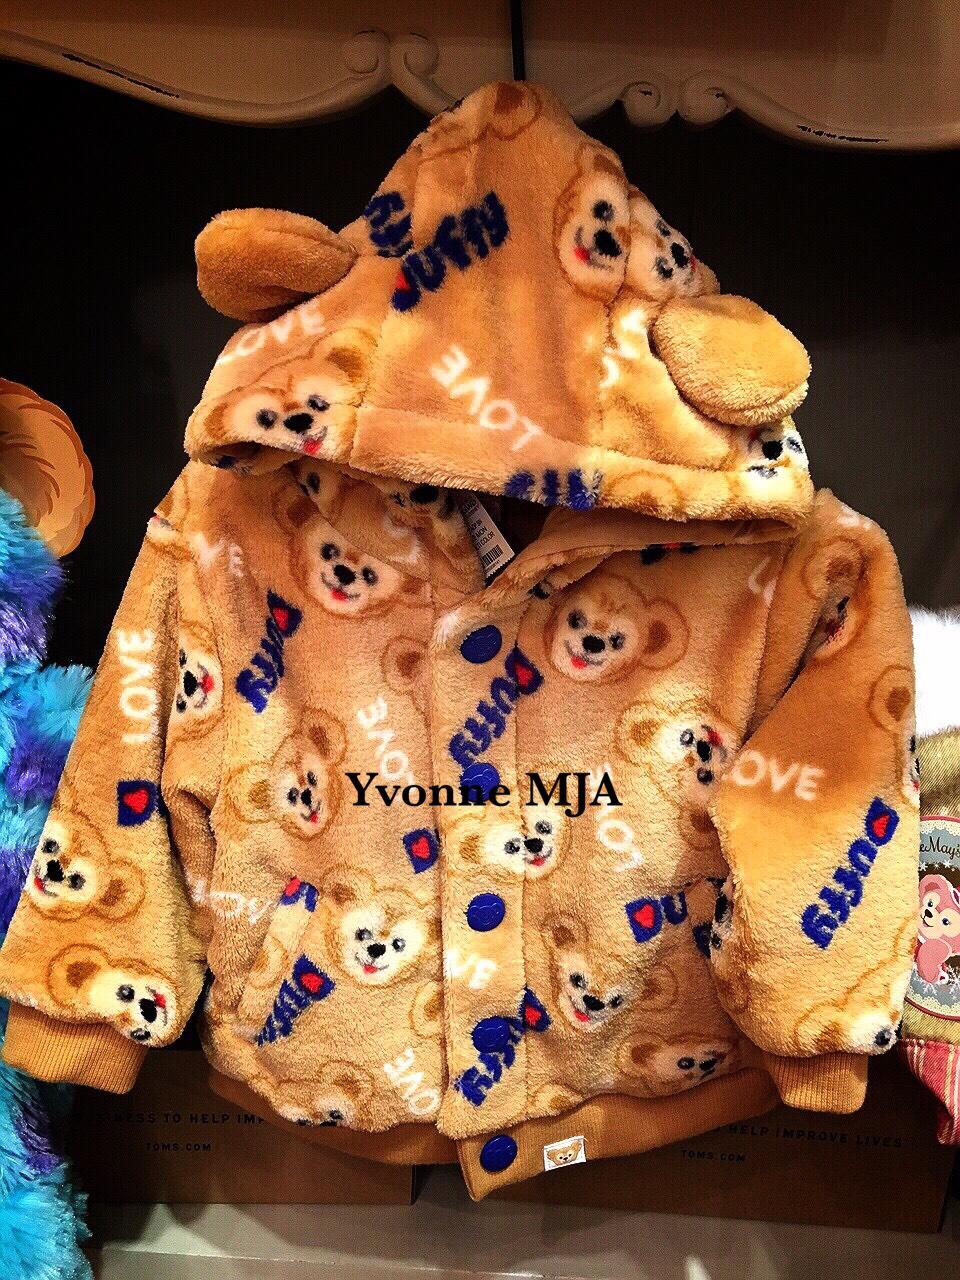 *Yvonne MJA香港代購*香港迪士尼Disney樂園限定正品Duffy達菲熊 小BABY 精緻連帽保暖外套